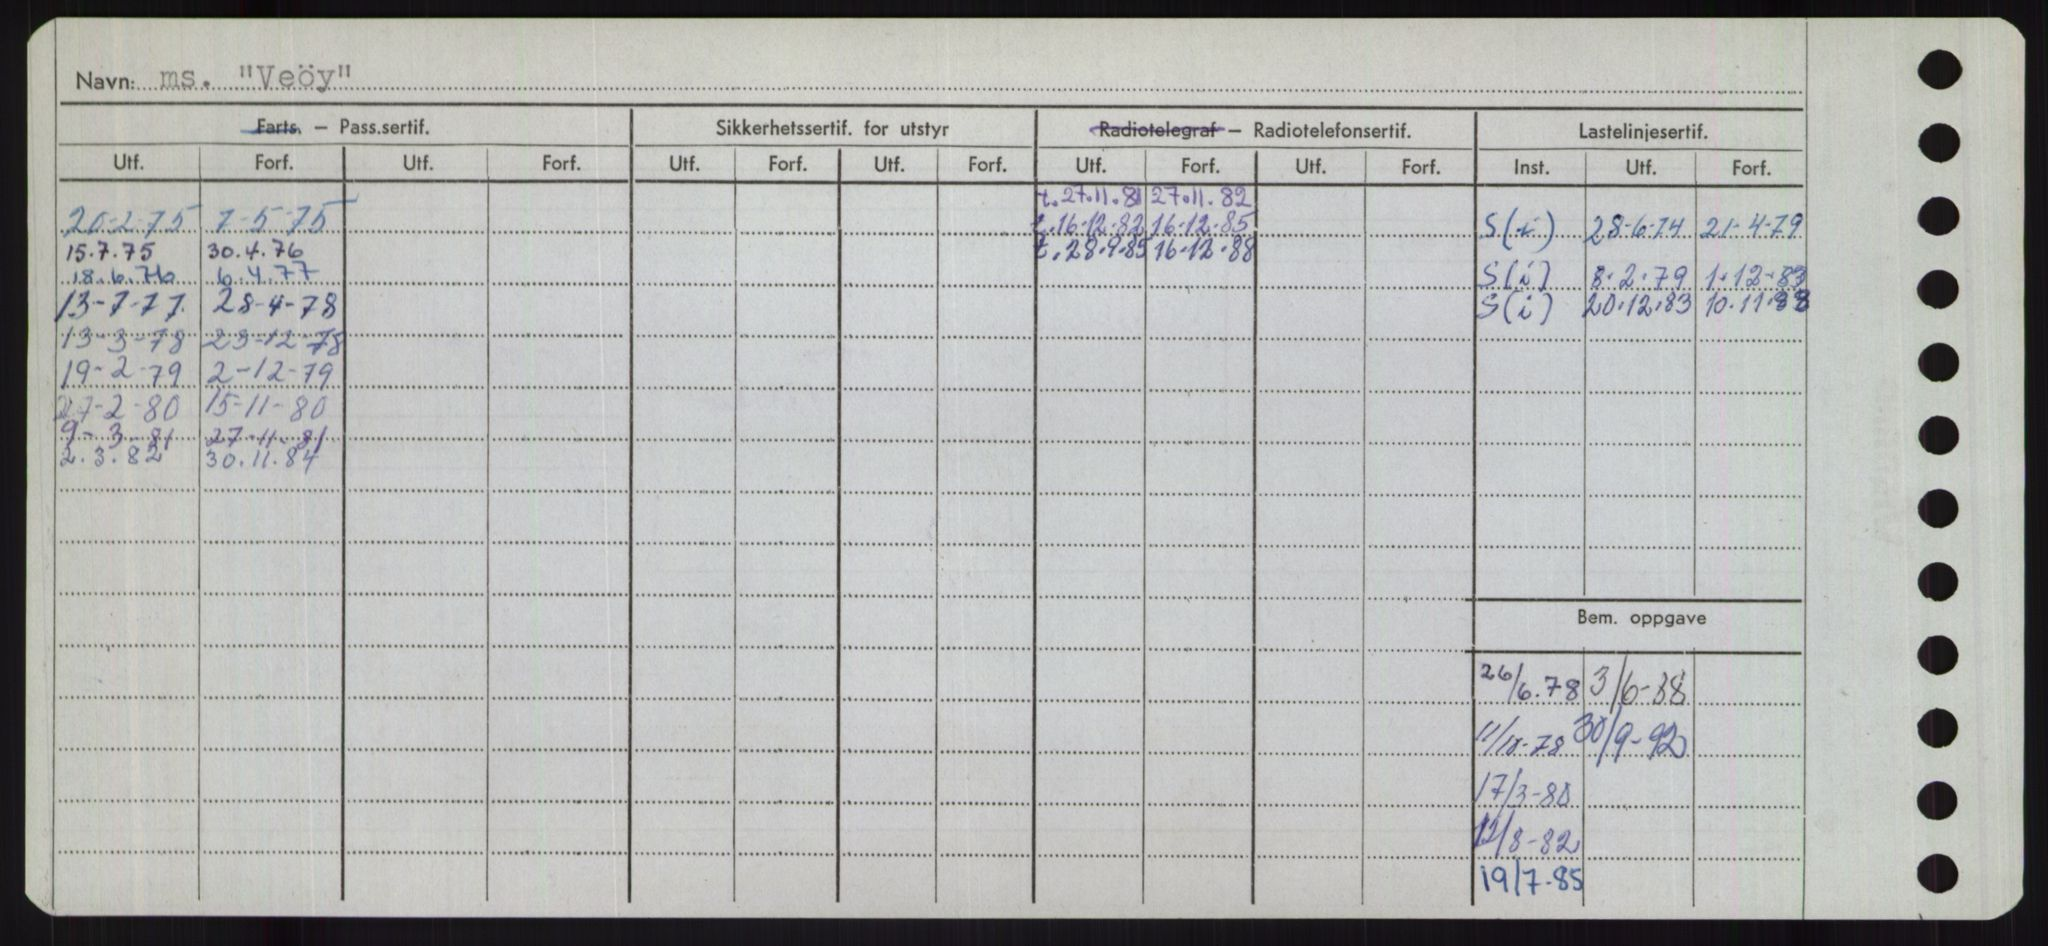 RA, Sjøfartsdirektoratet med forløpere, Skipsmålingen, H/Ha/L0006: Fartøy, Sver-Å, s. 396